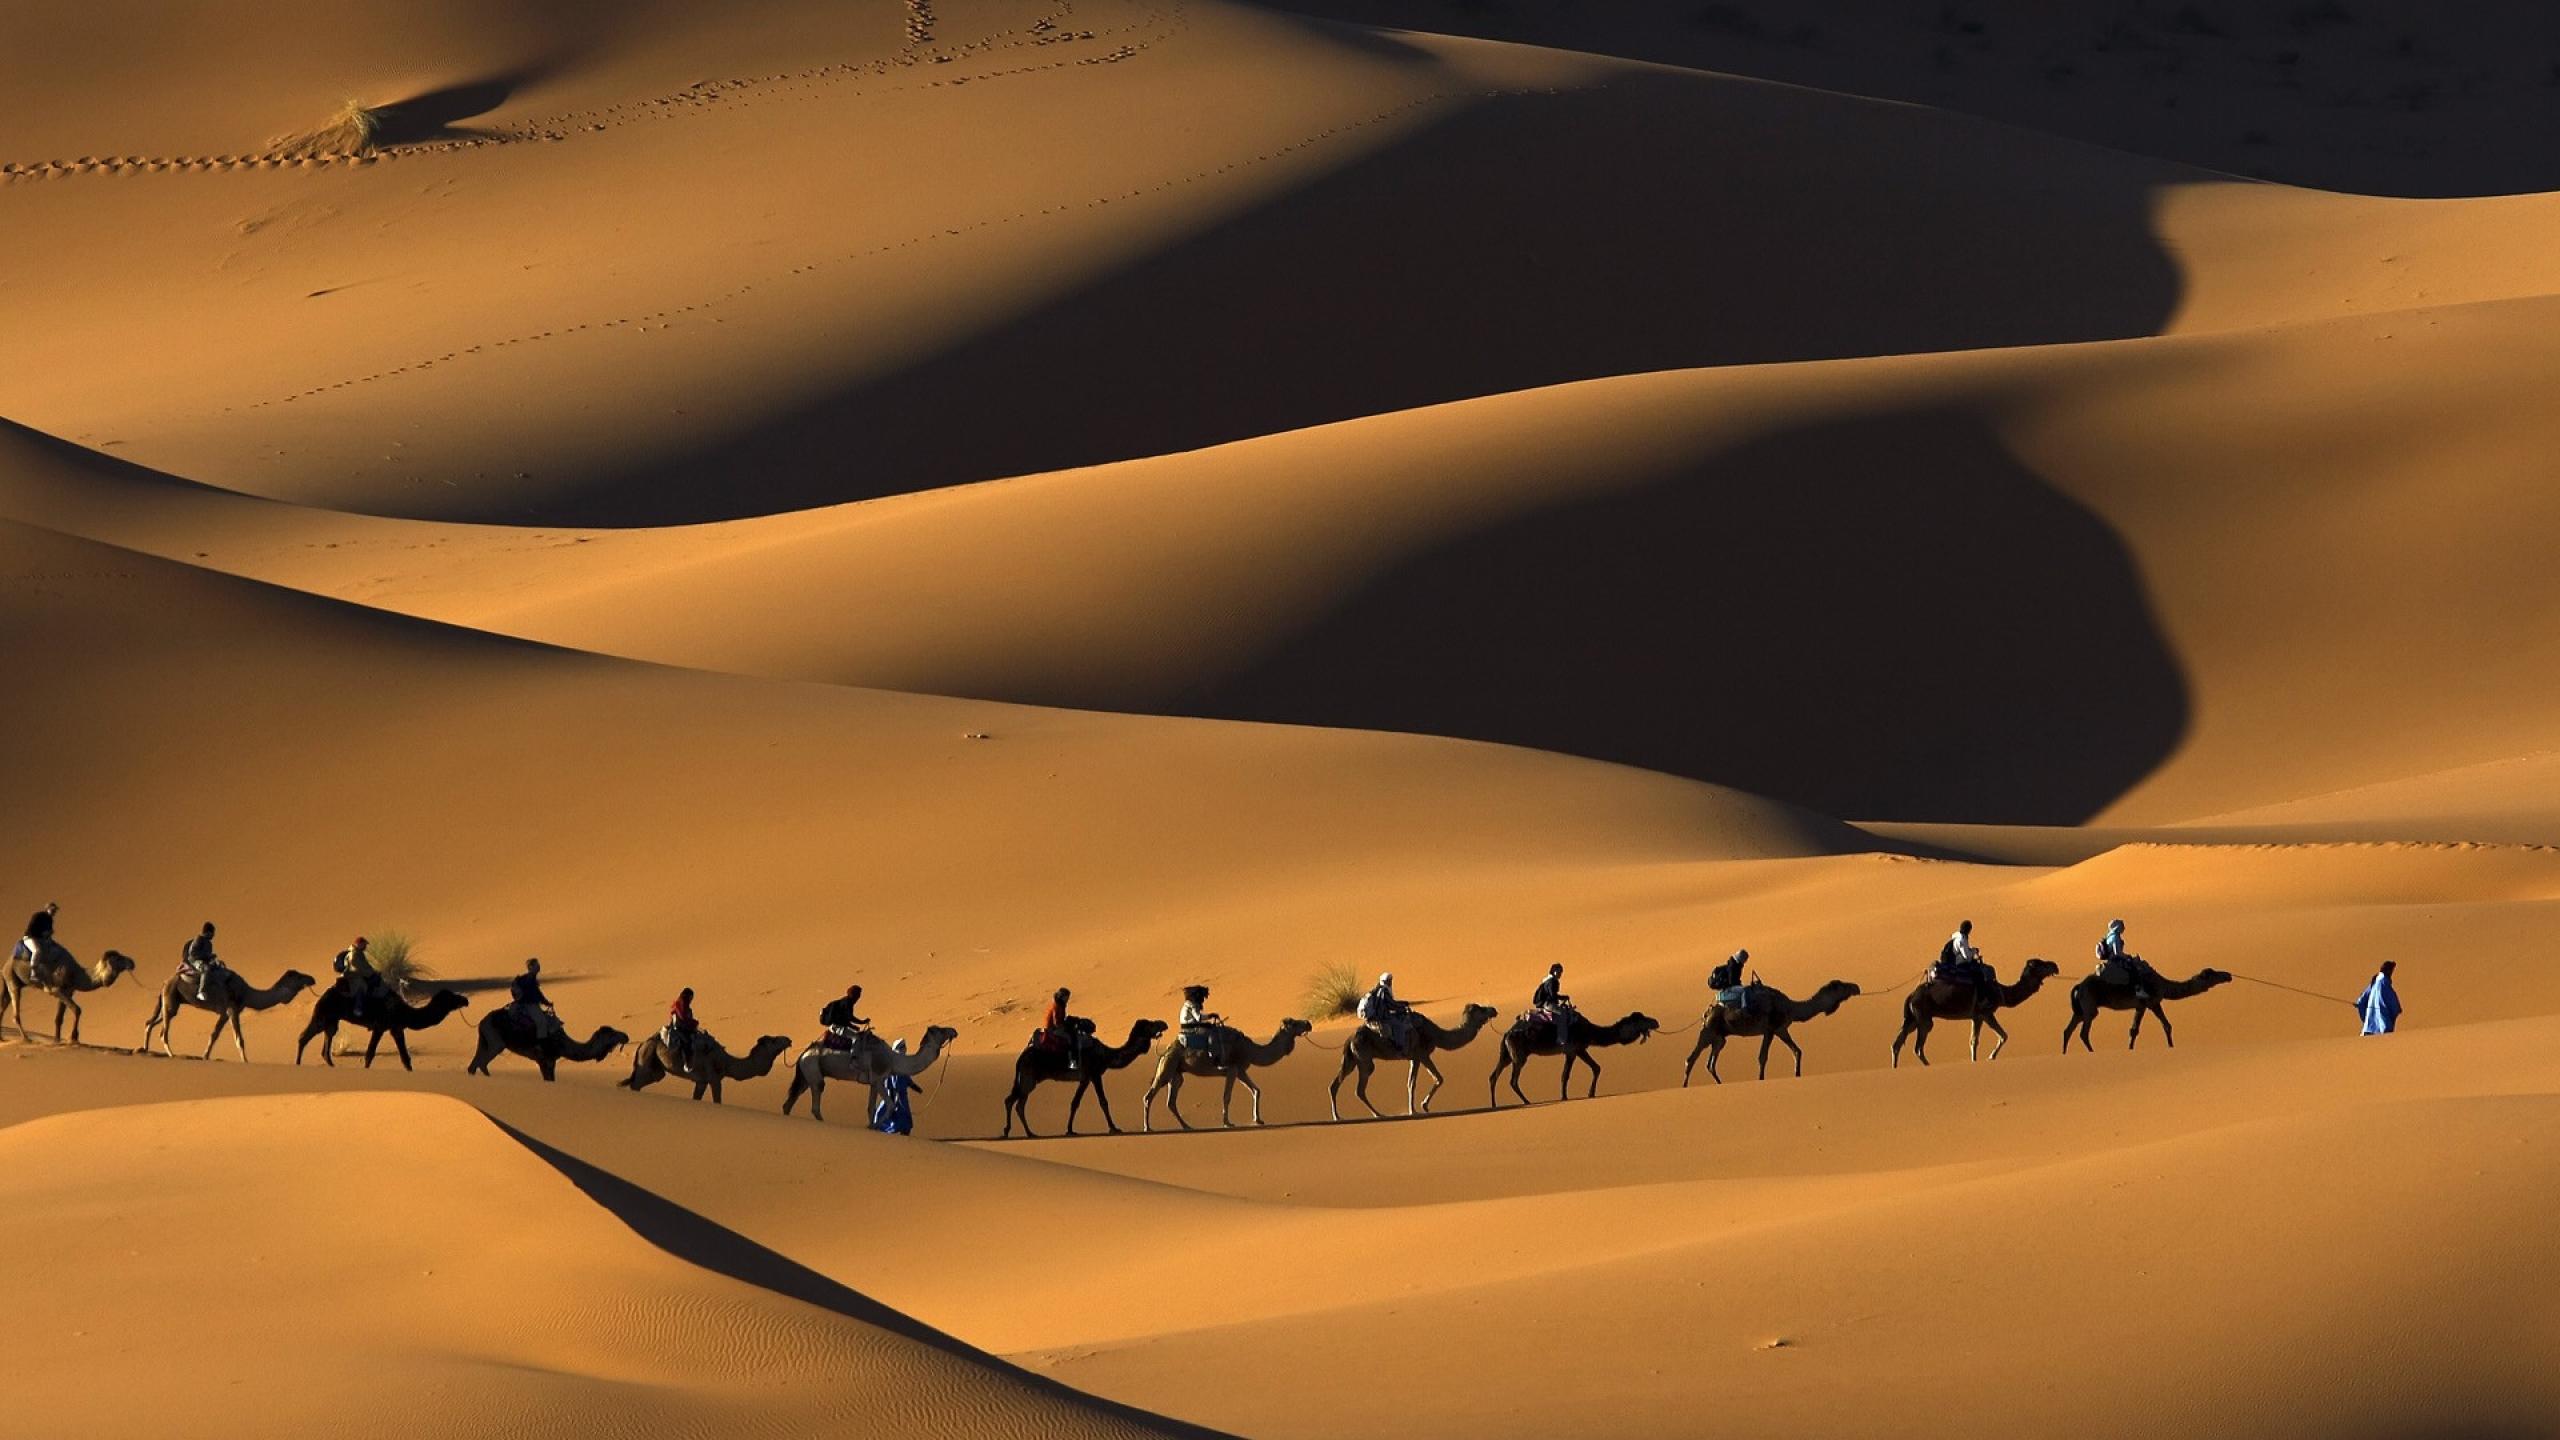 Camel widescreen for desktop